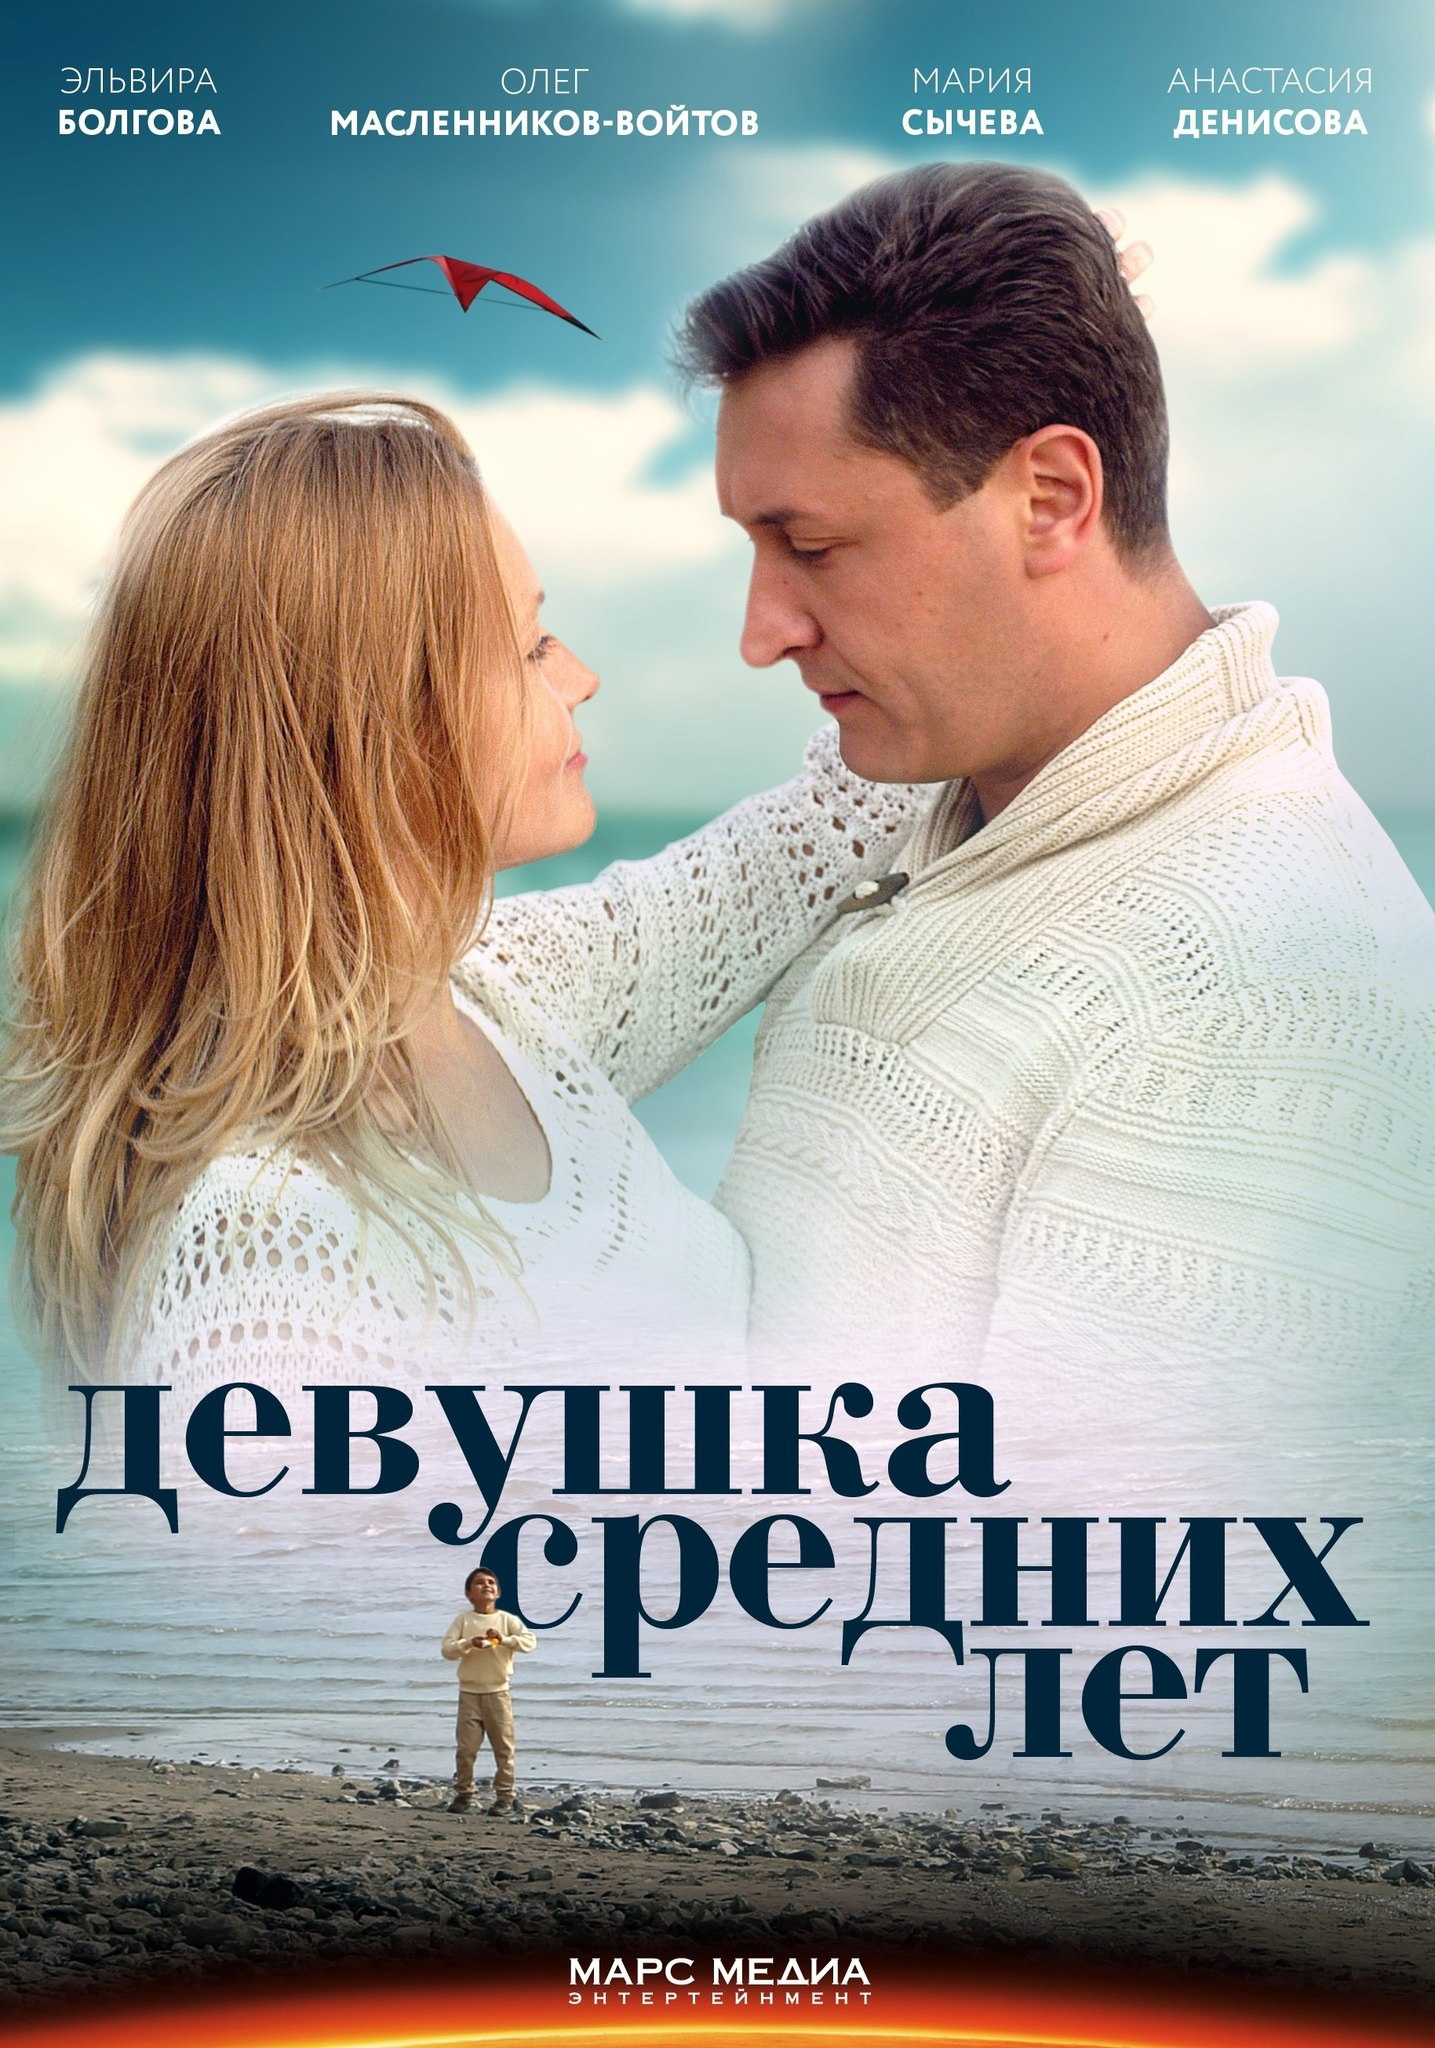 Мелодрама «Дeвyшкa cpeдниx лeт» (2014) 1-4 серия из 4 HD